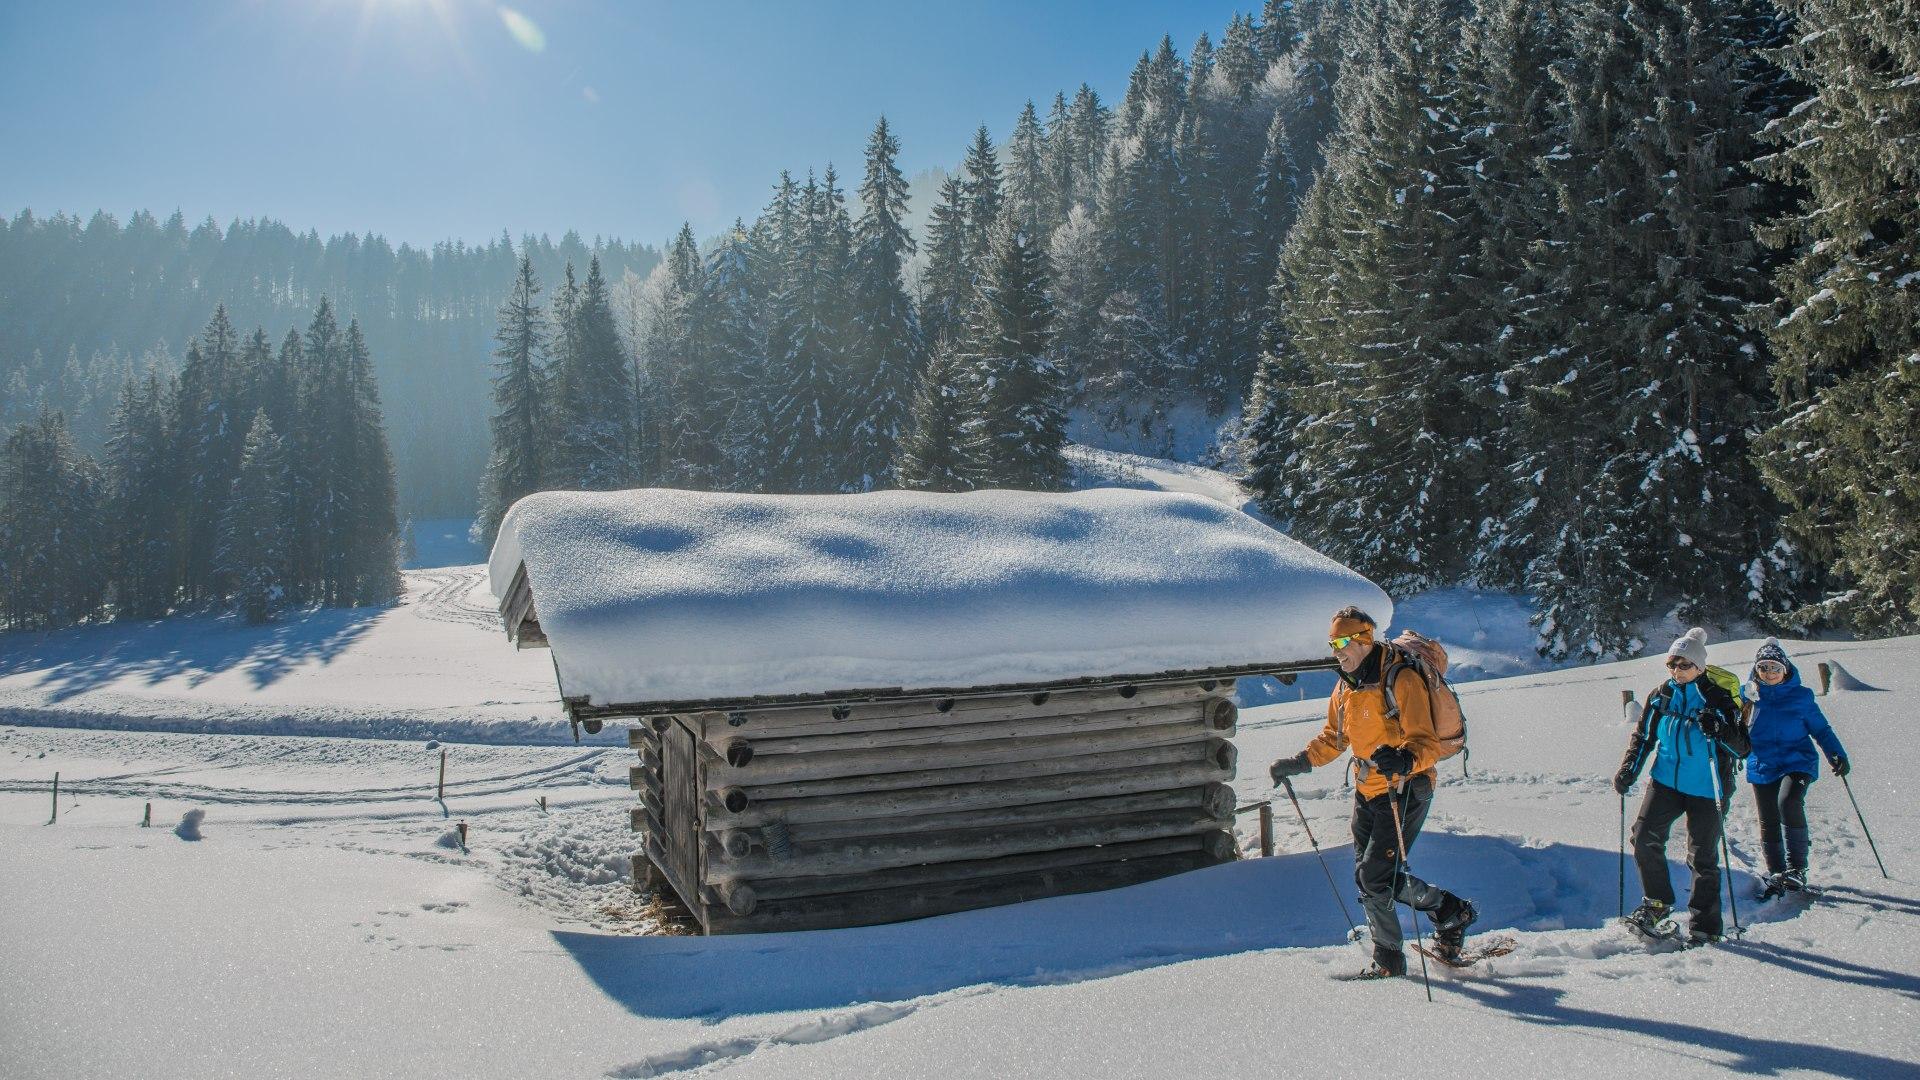 Schneeschuhtour im Suttengebiet, © Christoph Schempershofe